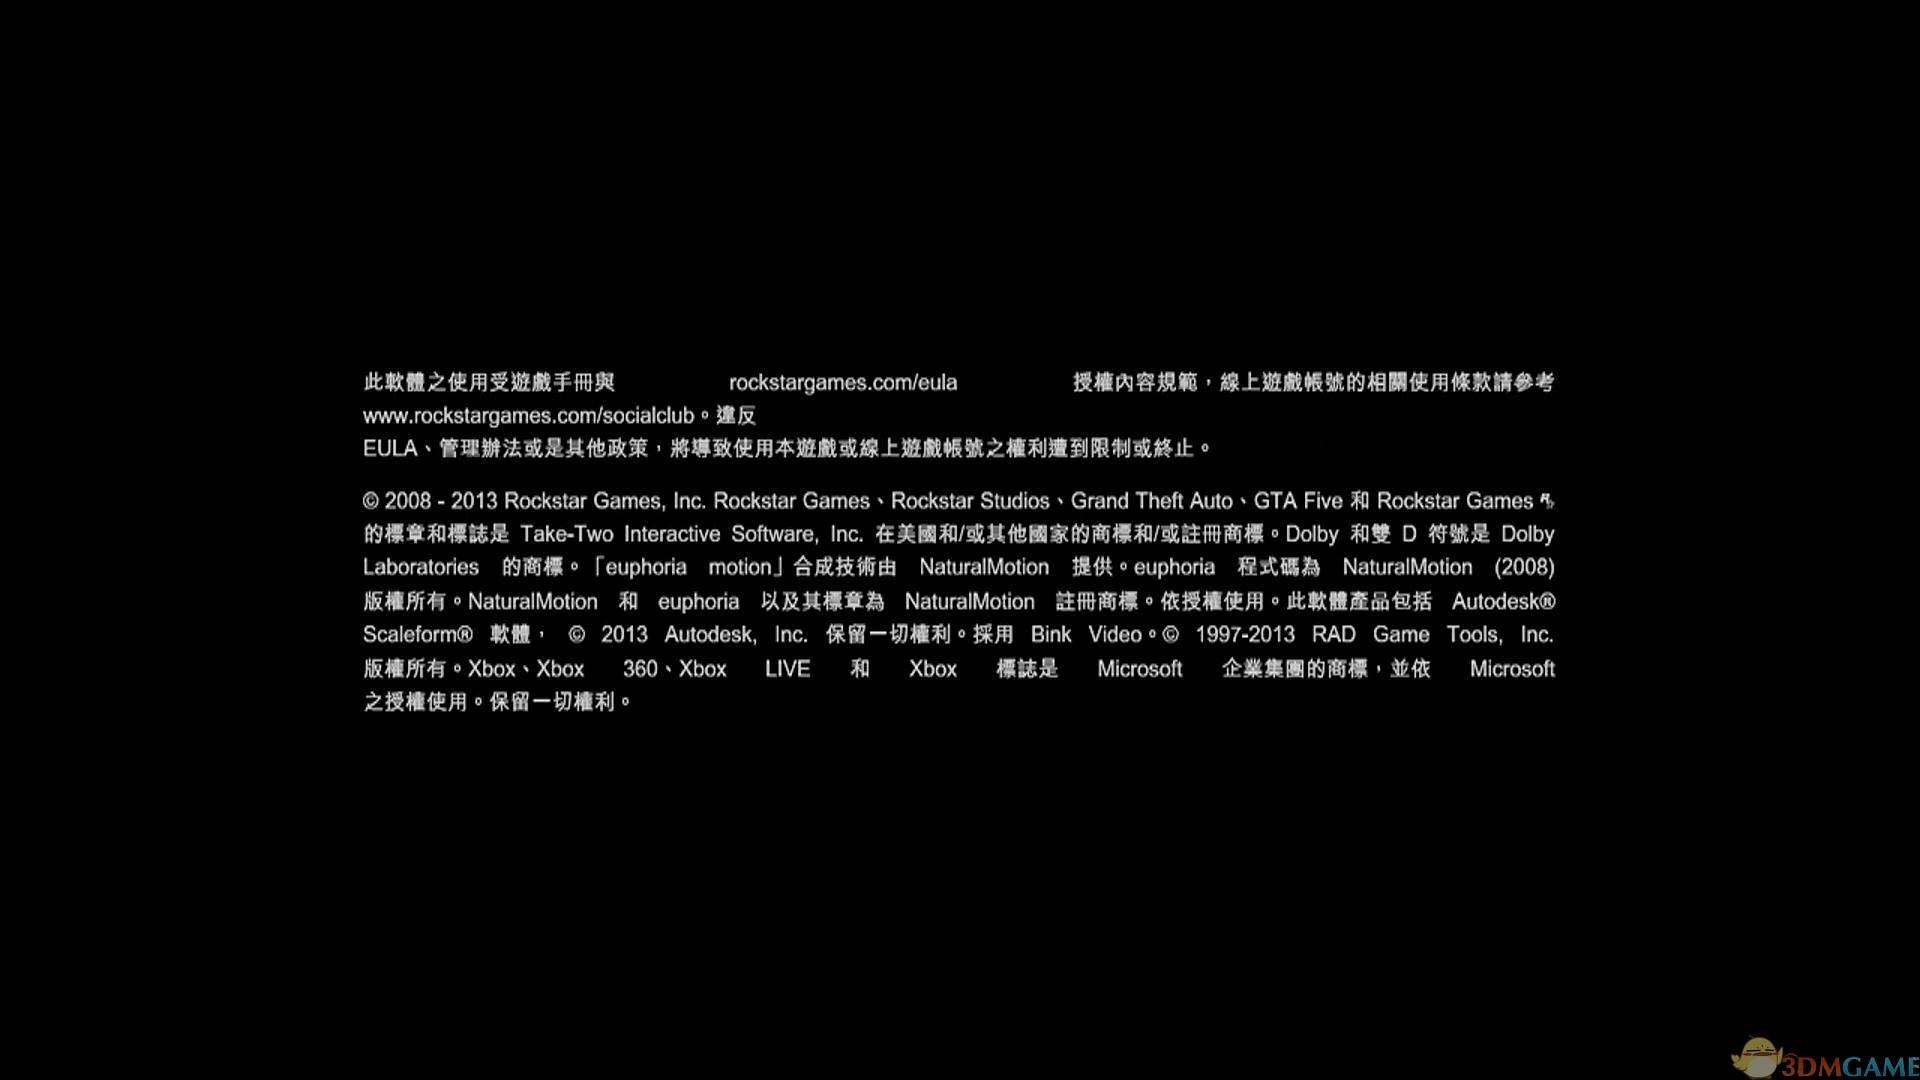 侠盗猎车5 v1.33升级档+破解补丁[RELOADED]